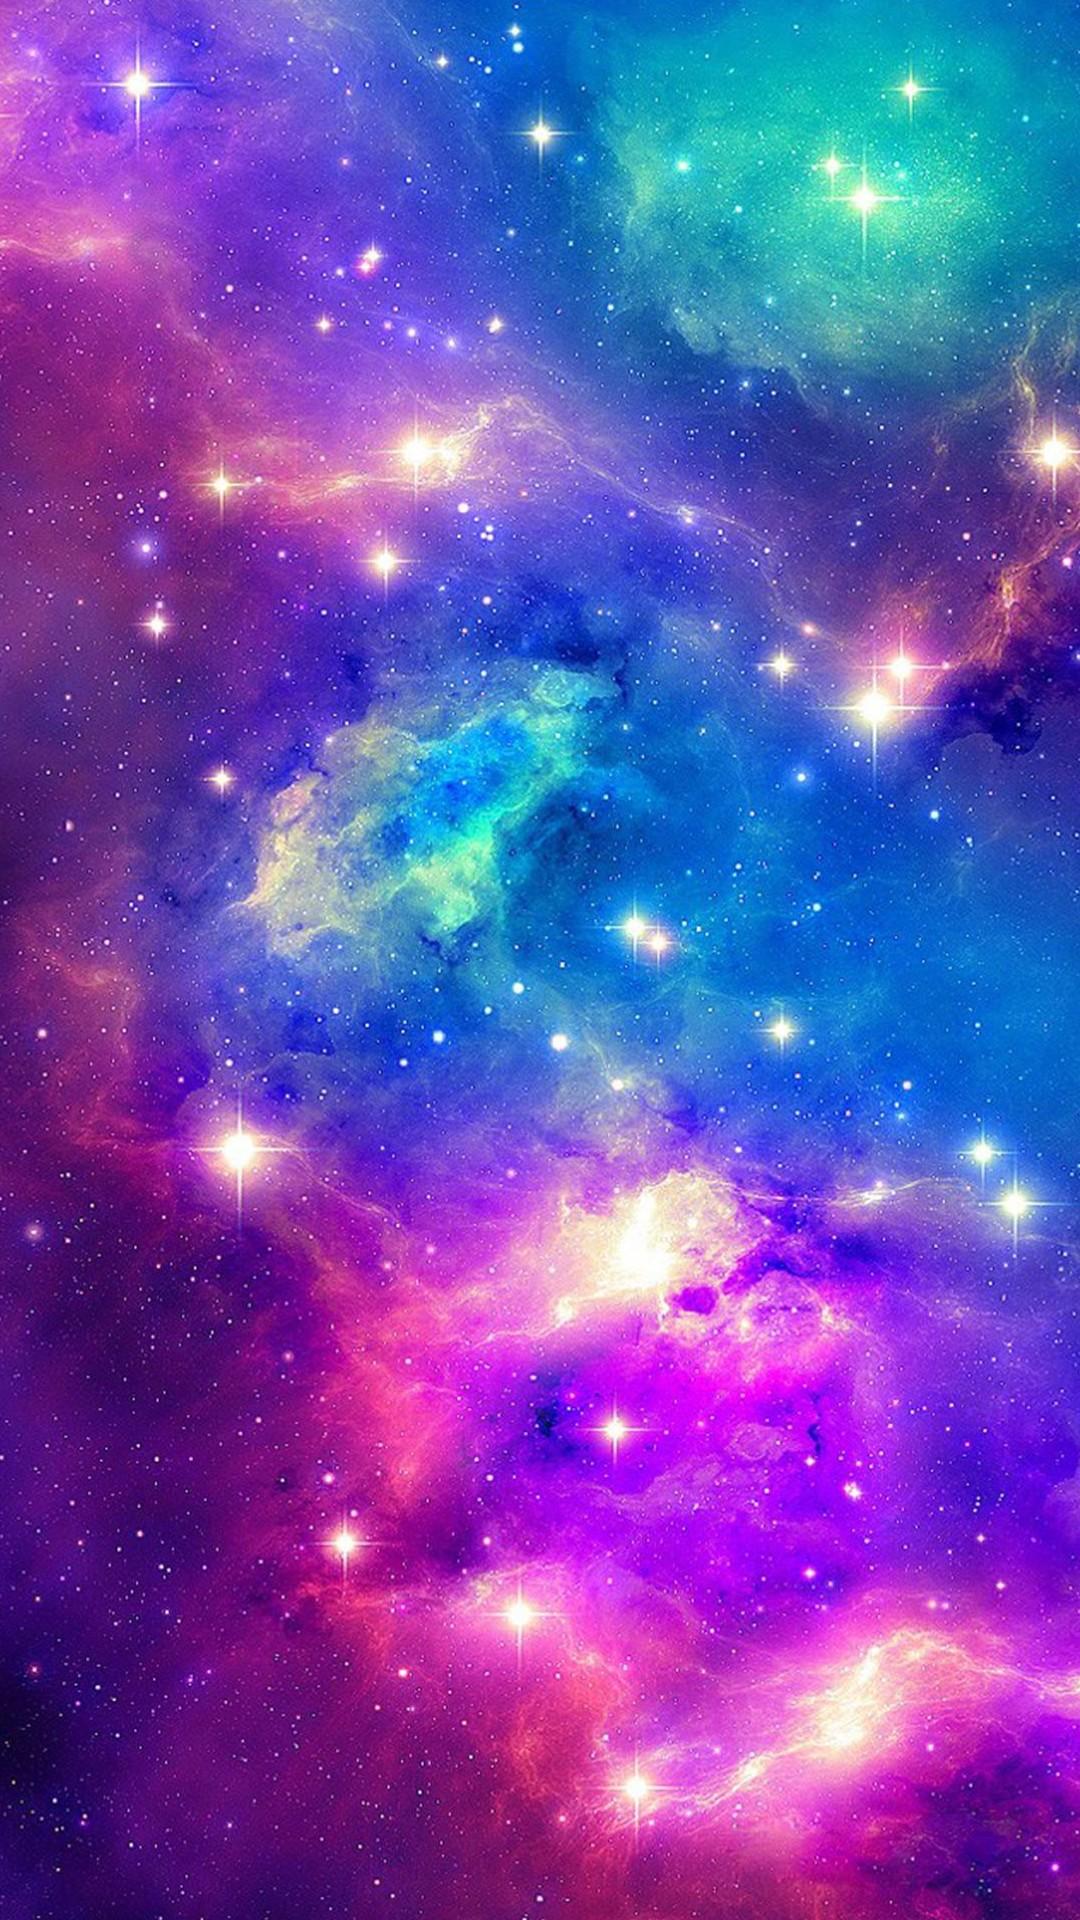 galaxy wallpaper tumblr hd - photo #15